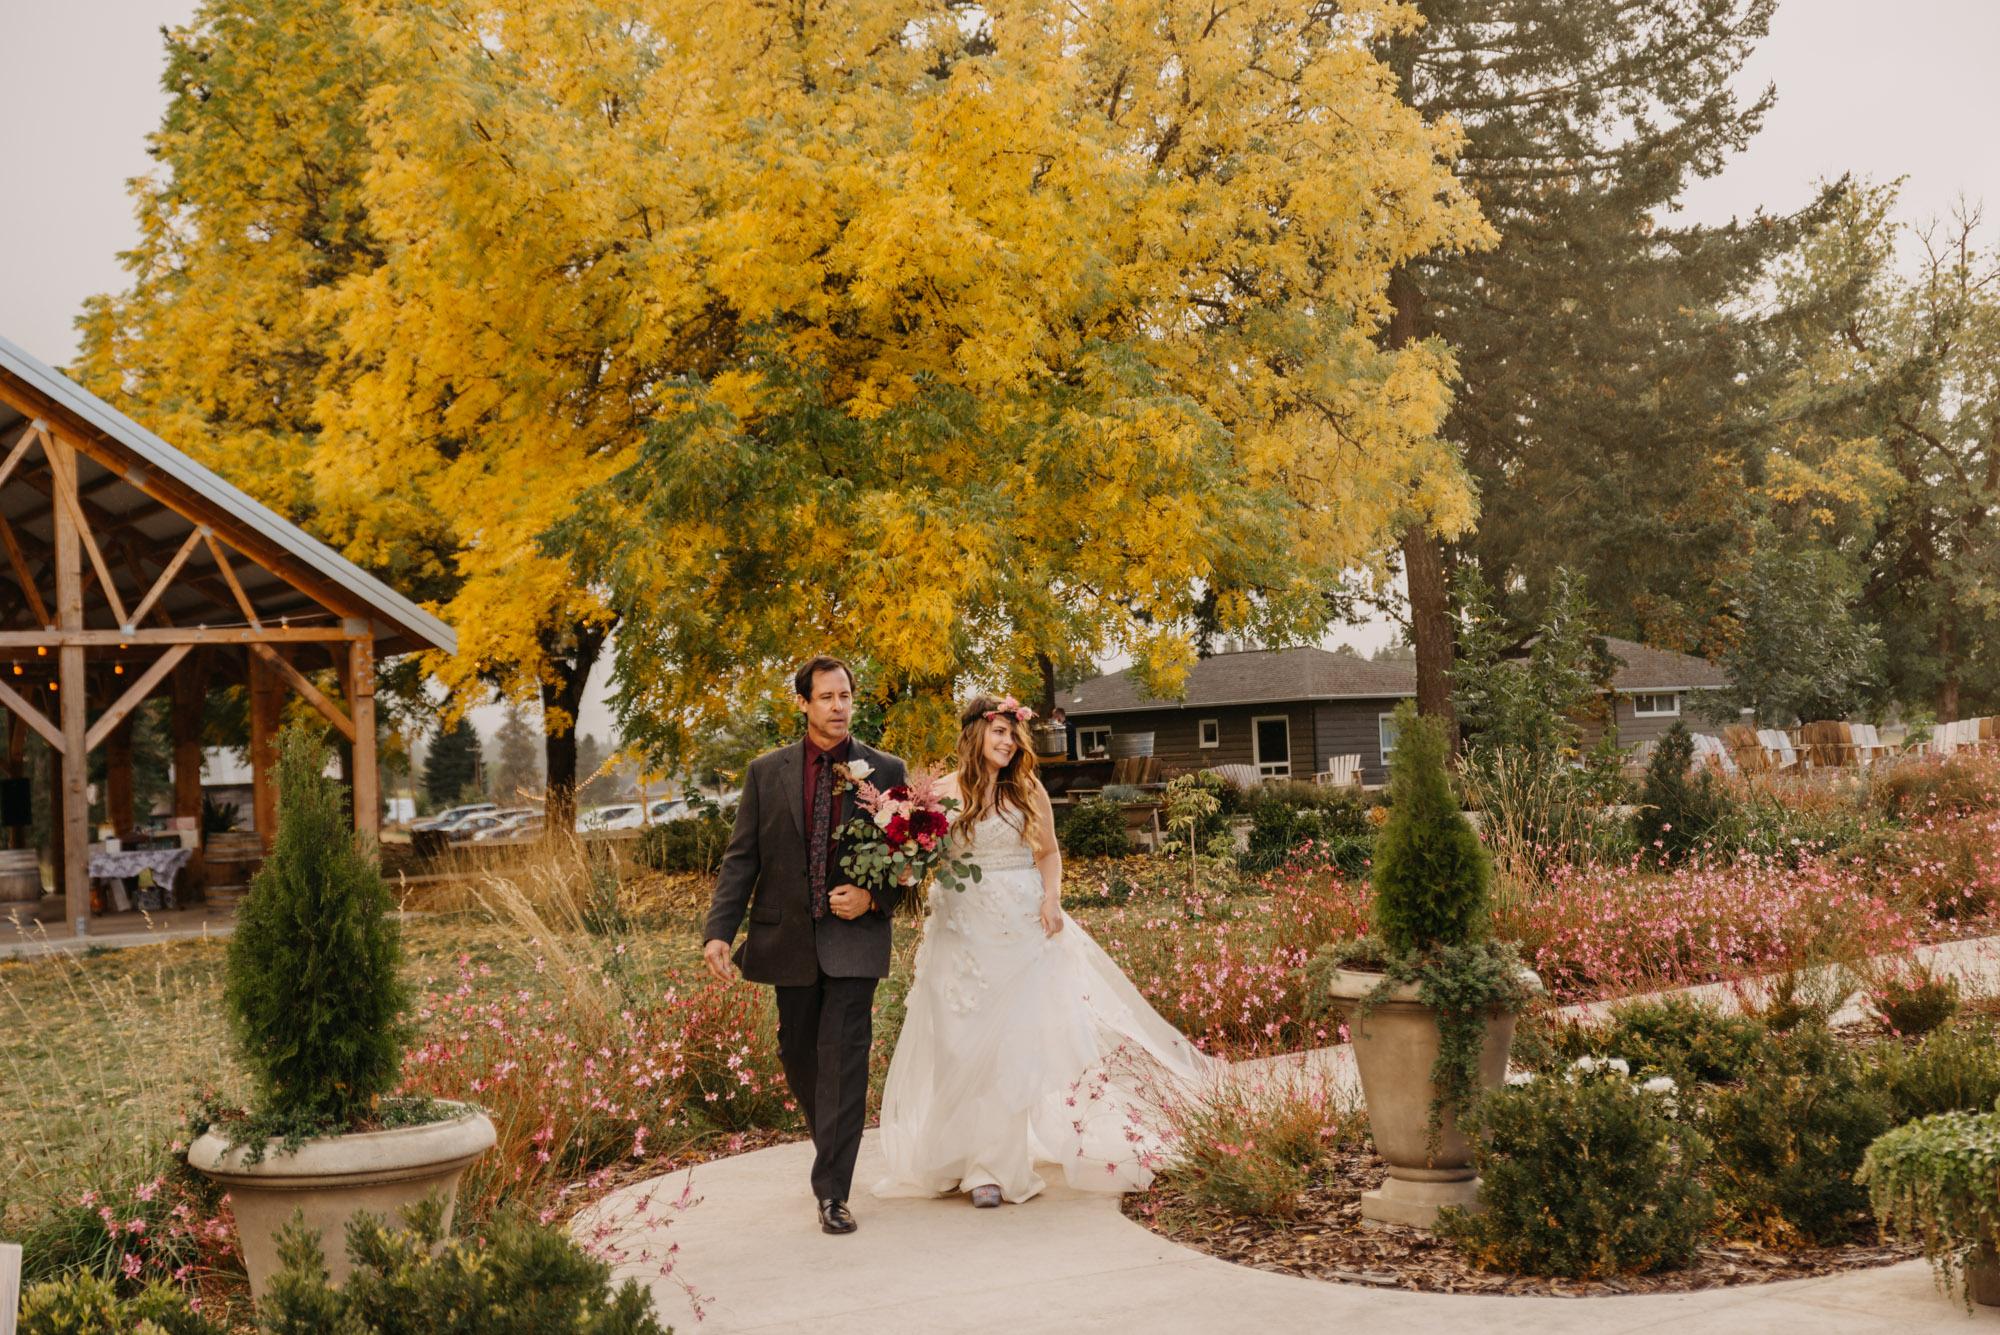 Outdoor-Summer-Ceremony-Washington-Wedding-Rainbow-5333.jpg